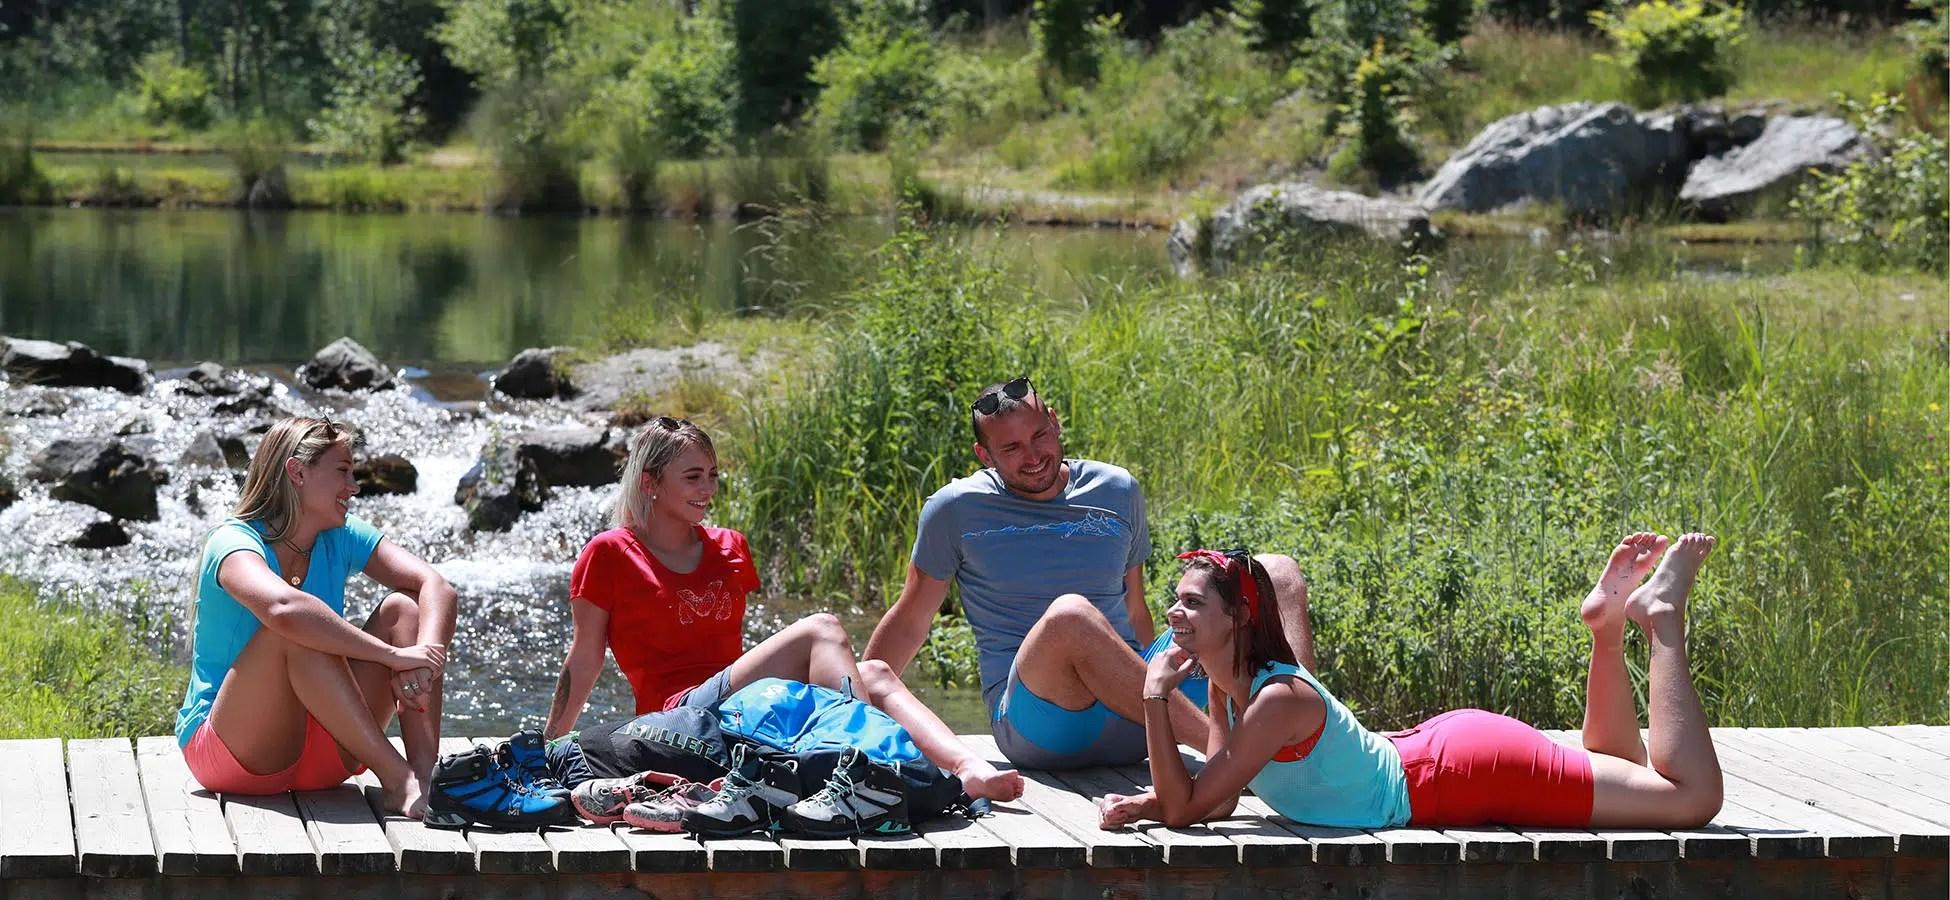 Bandeau Photographe Tourisme Corporate Packshot